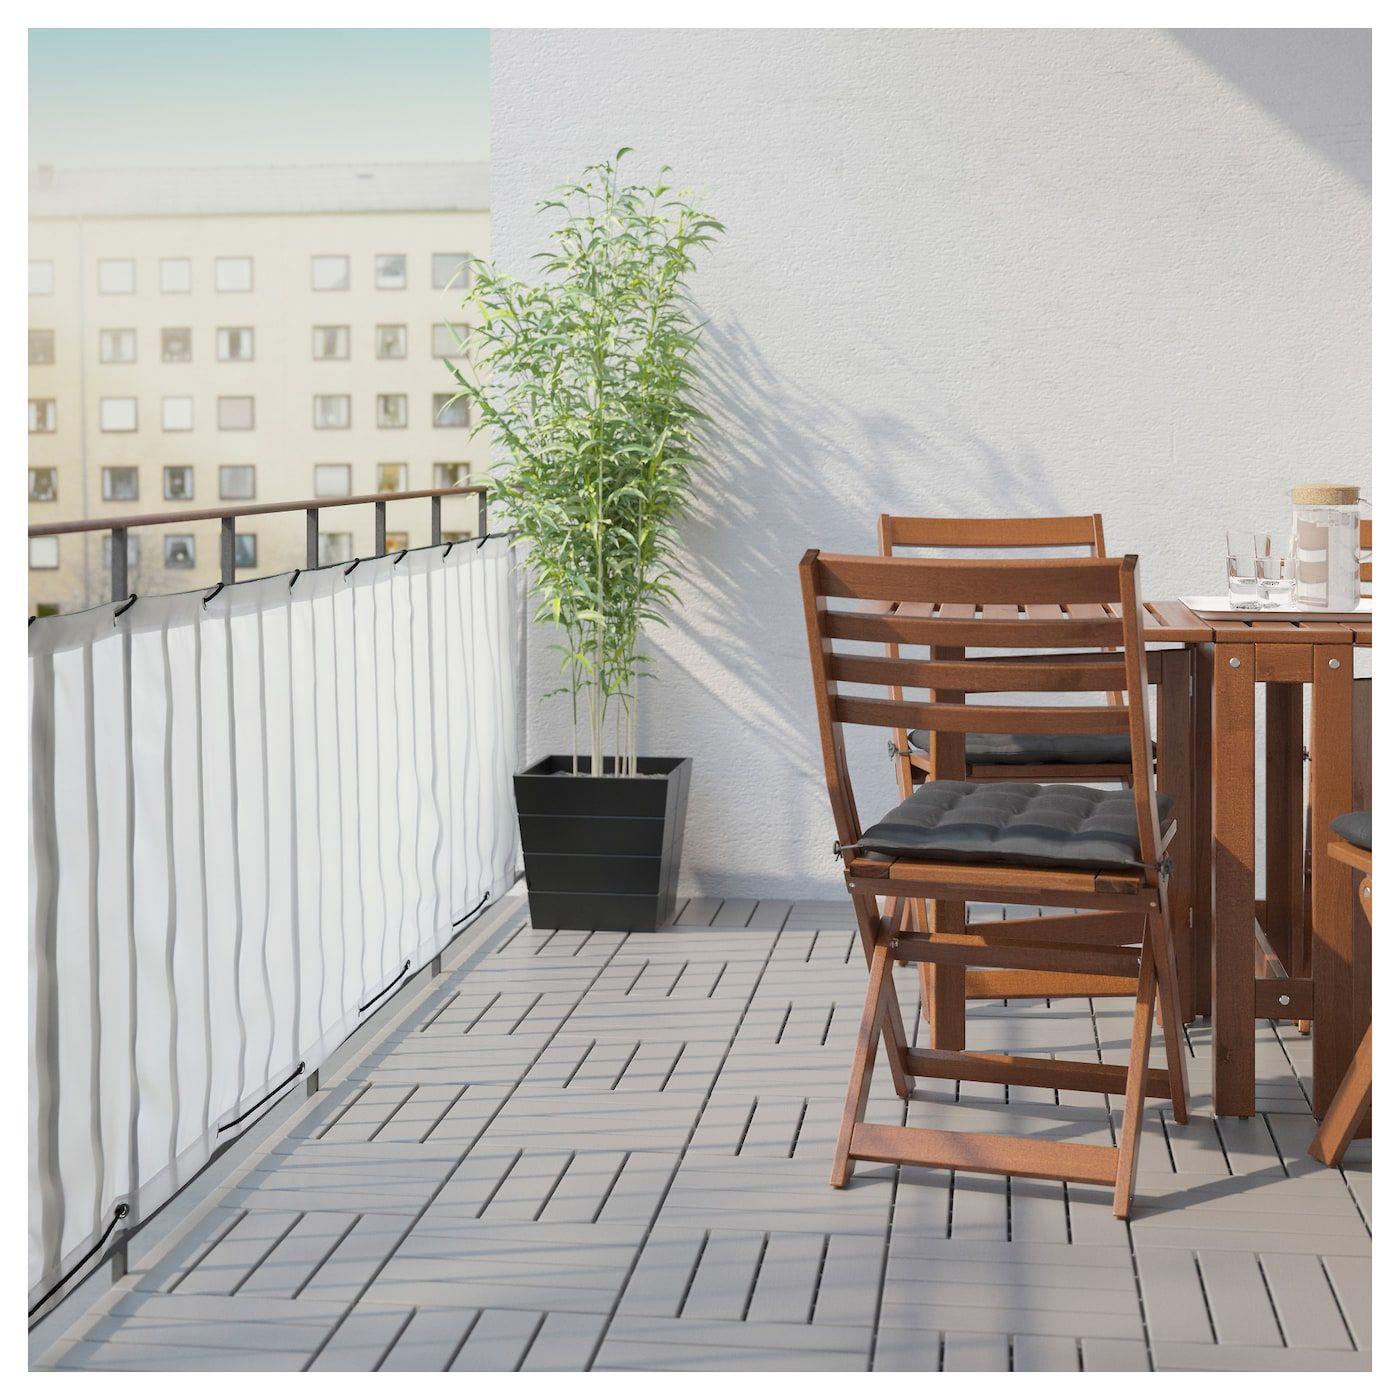 Dyning Brise Vue Pour Balcon Blanc 98 3 8x31 1 2 250x80 Cm